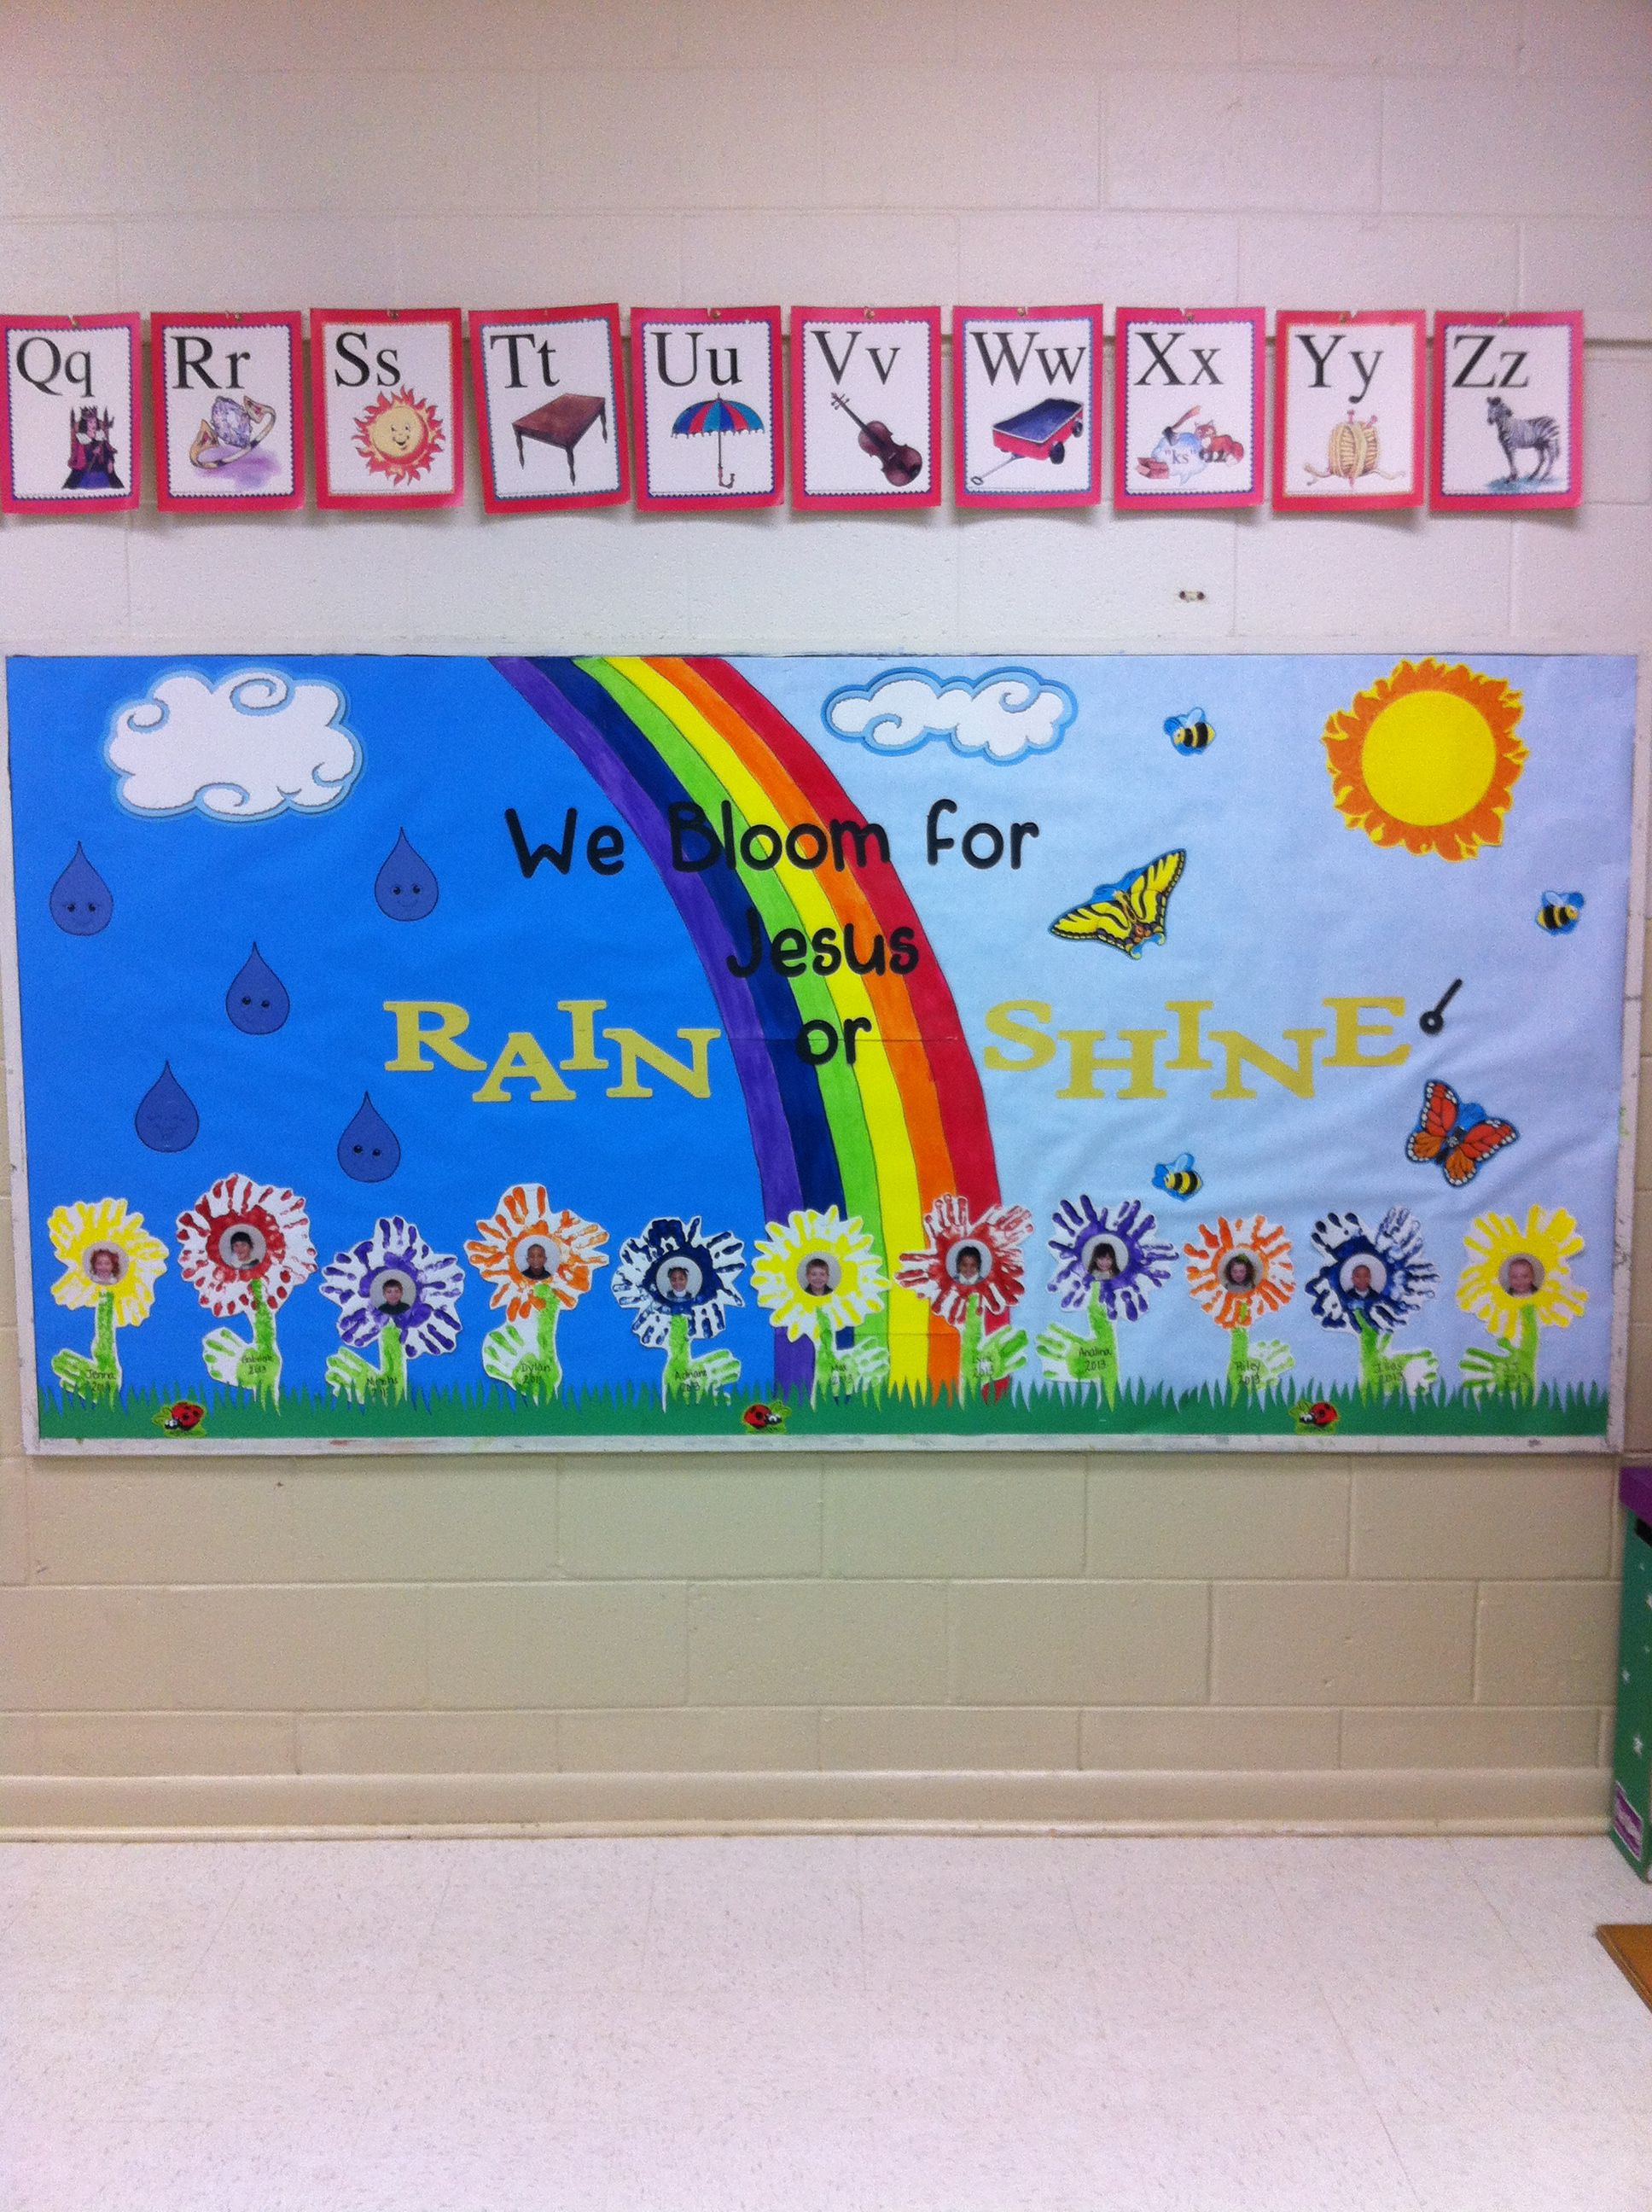 April Showers Bring May Flowers Bulletin Board Spring Boards Preschool Easter